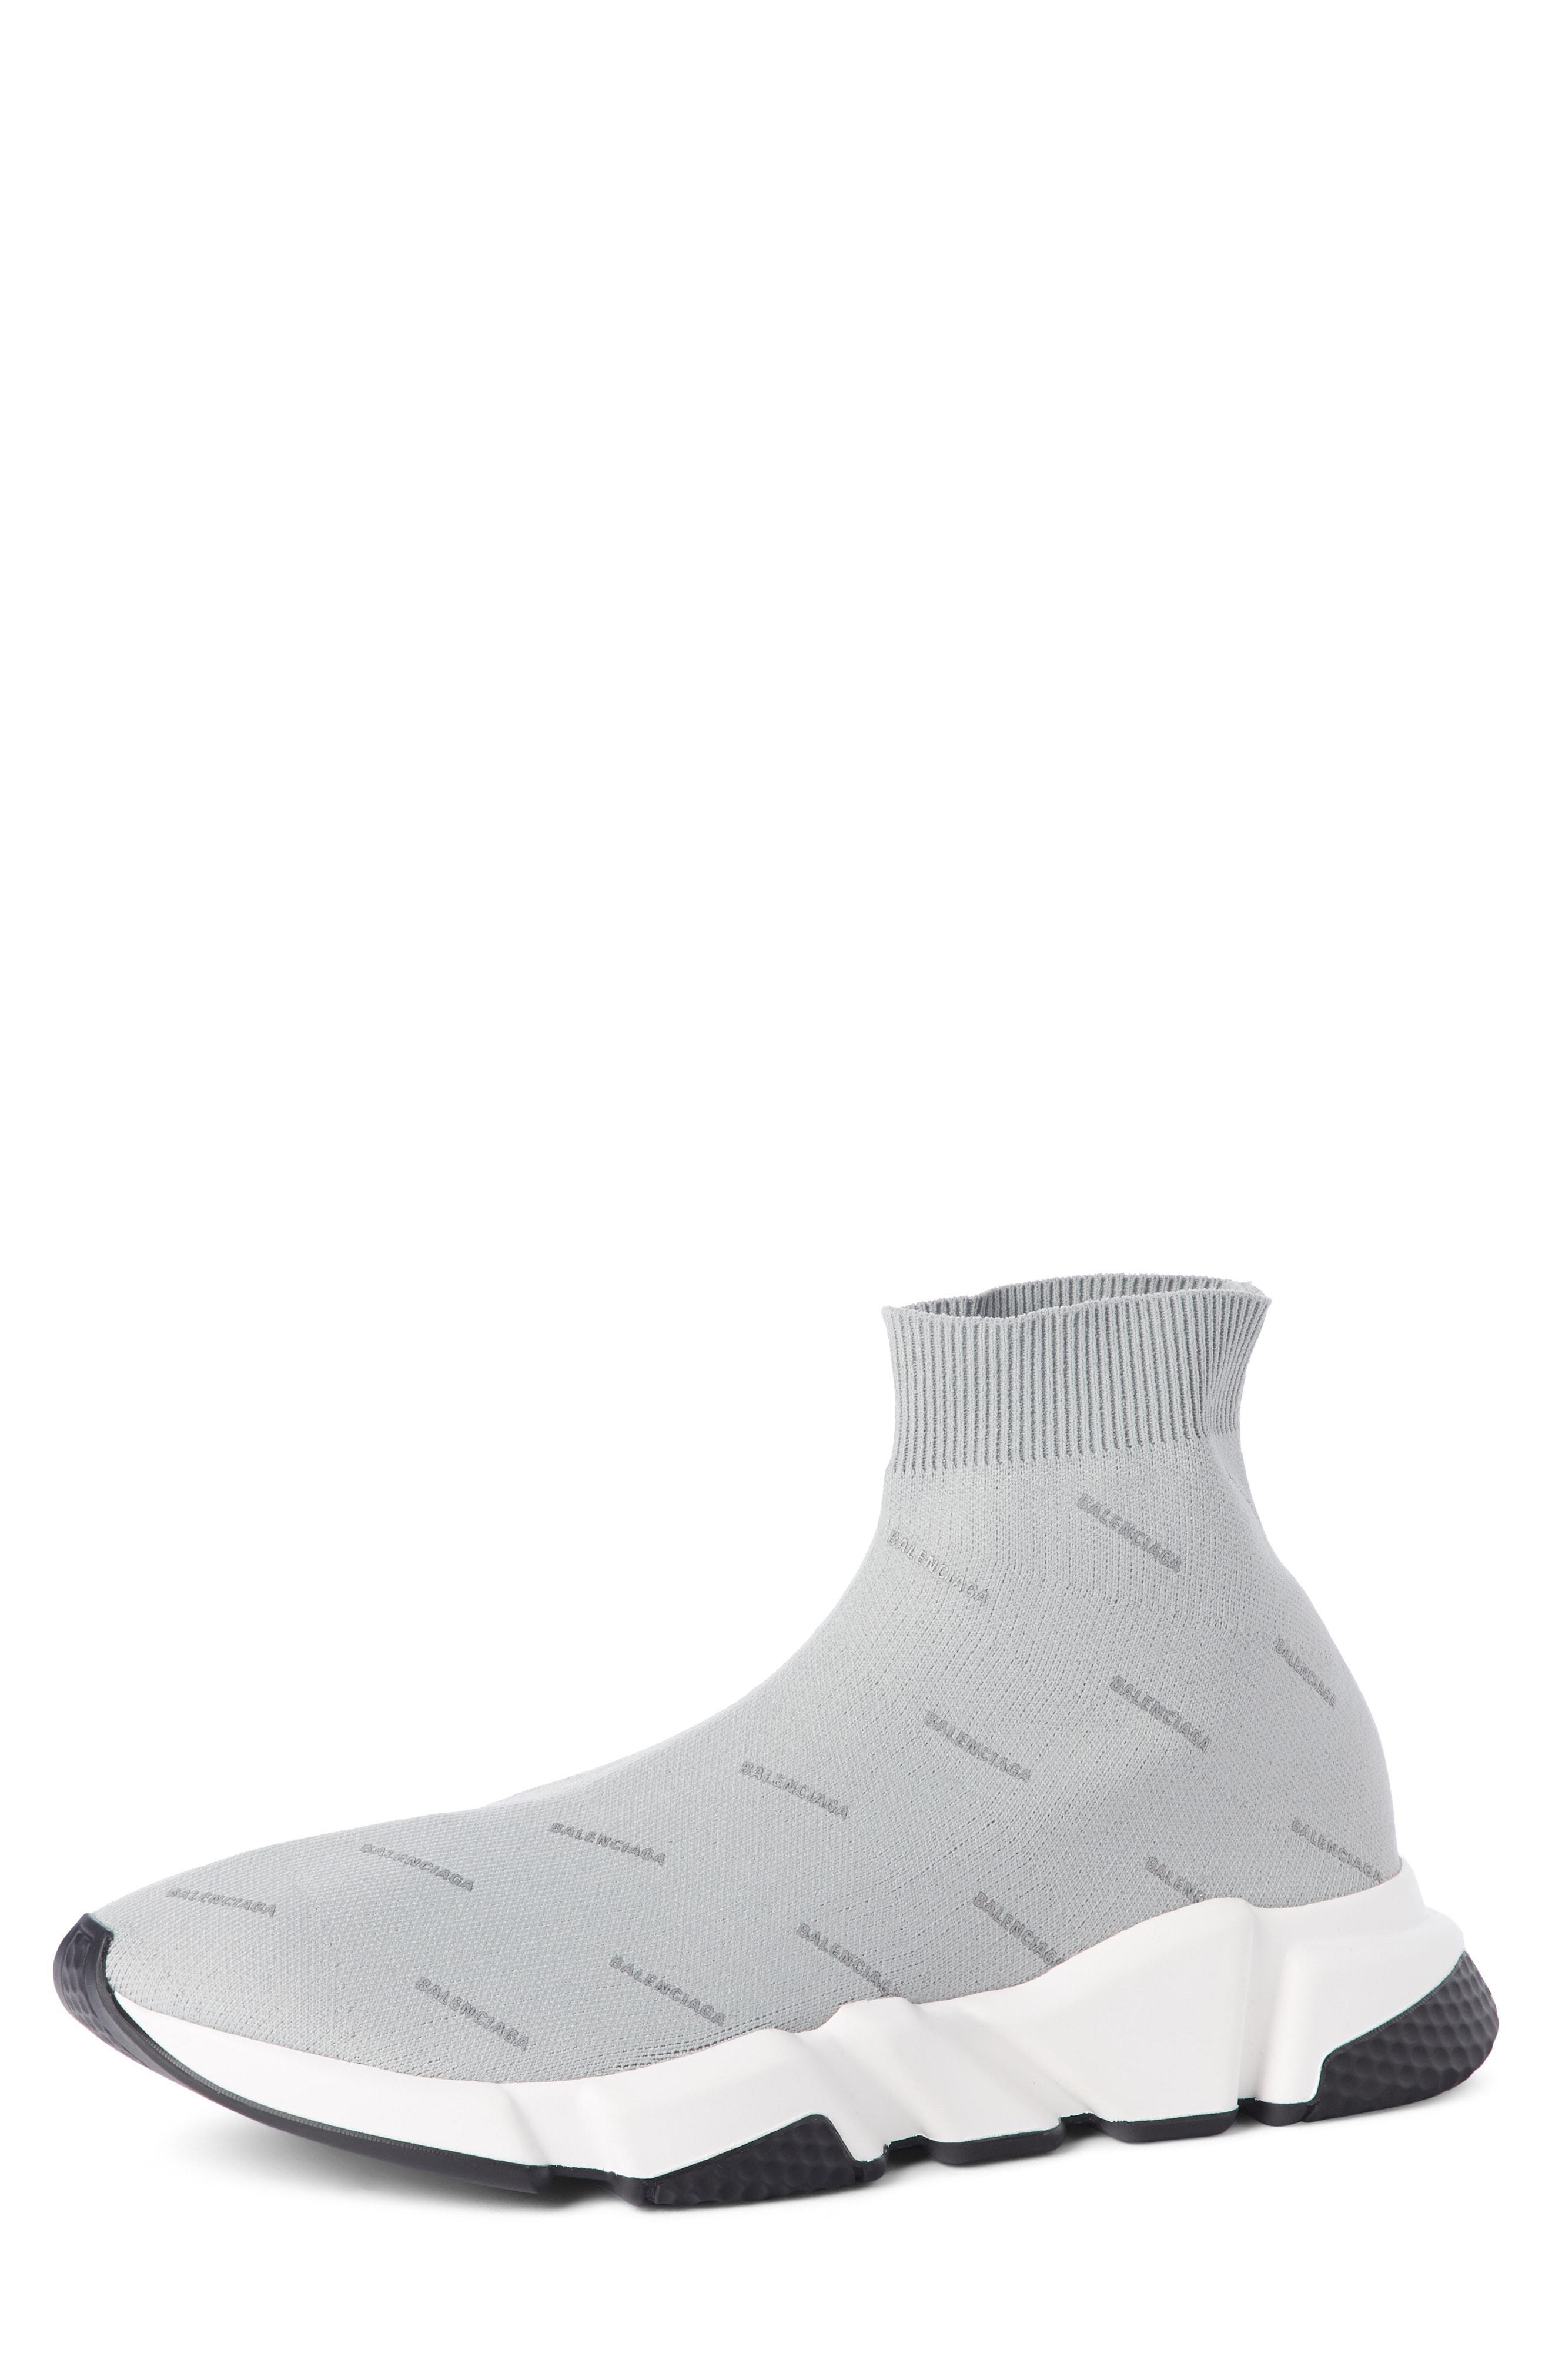 Balenciaga Denim Speed Knit Sneakers in